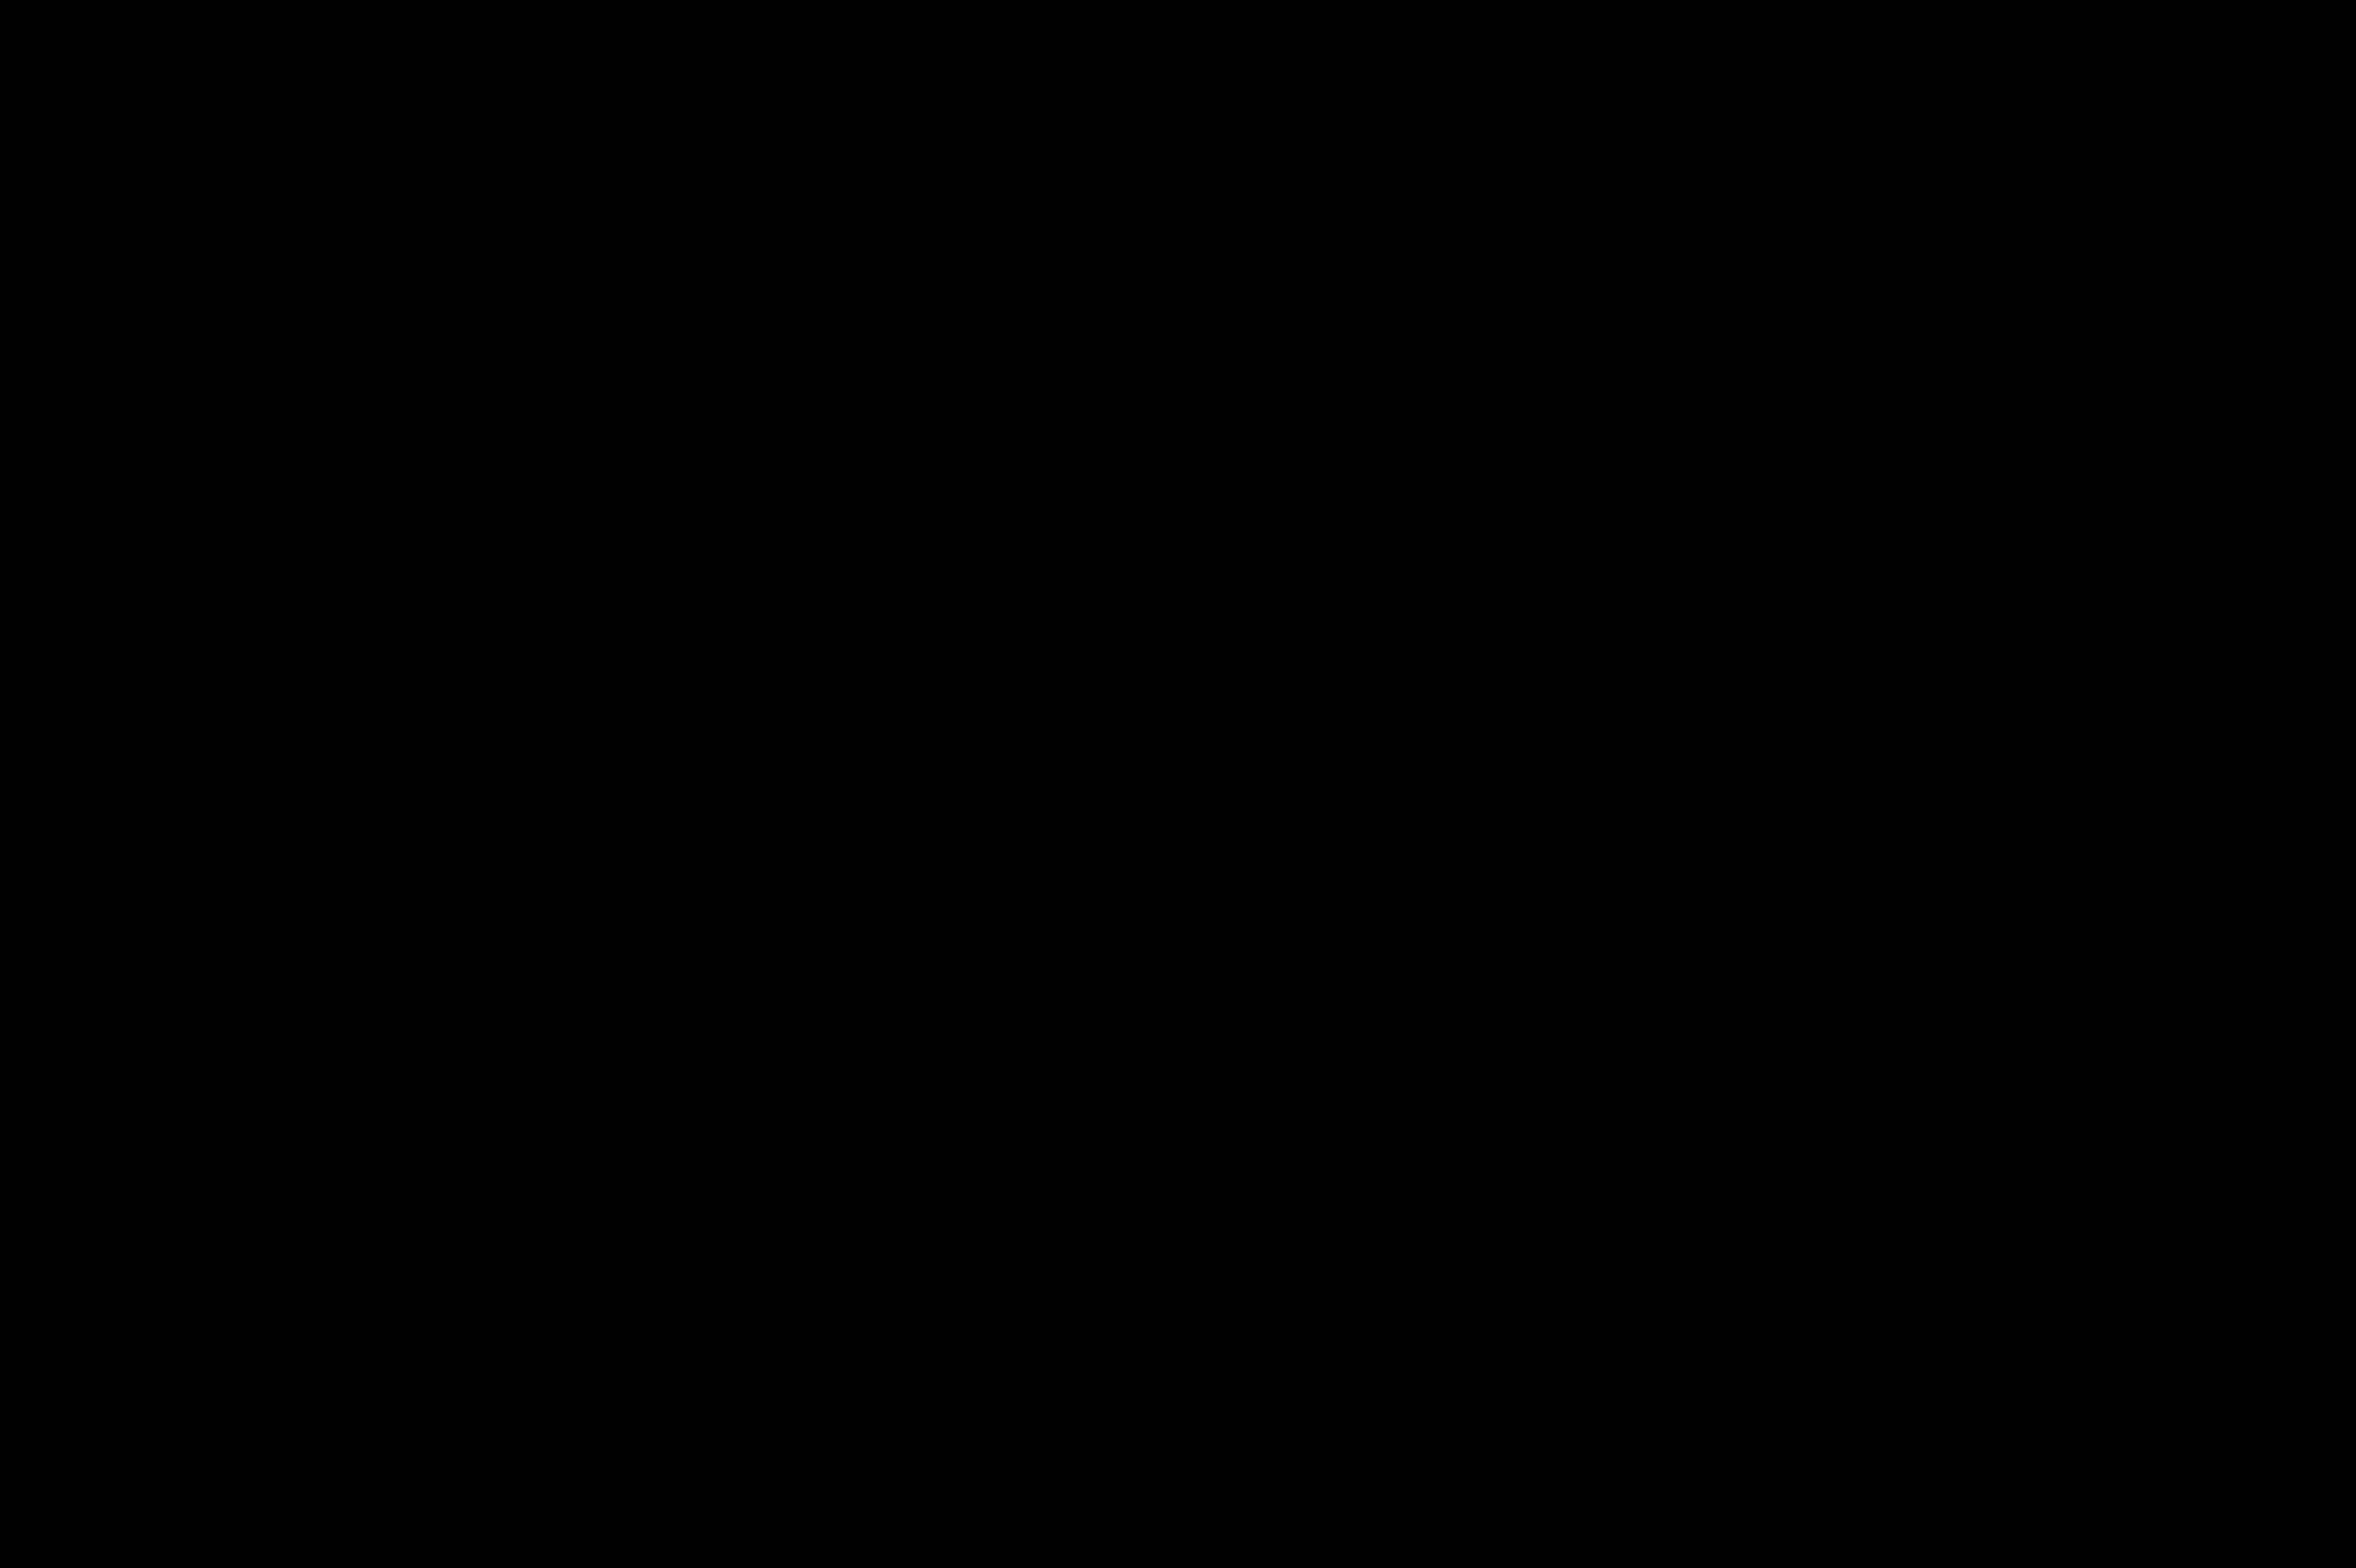 Aanvoerslang 8 mm wit 10 meter rol